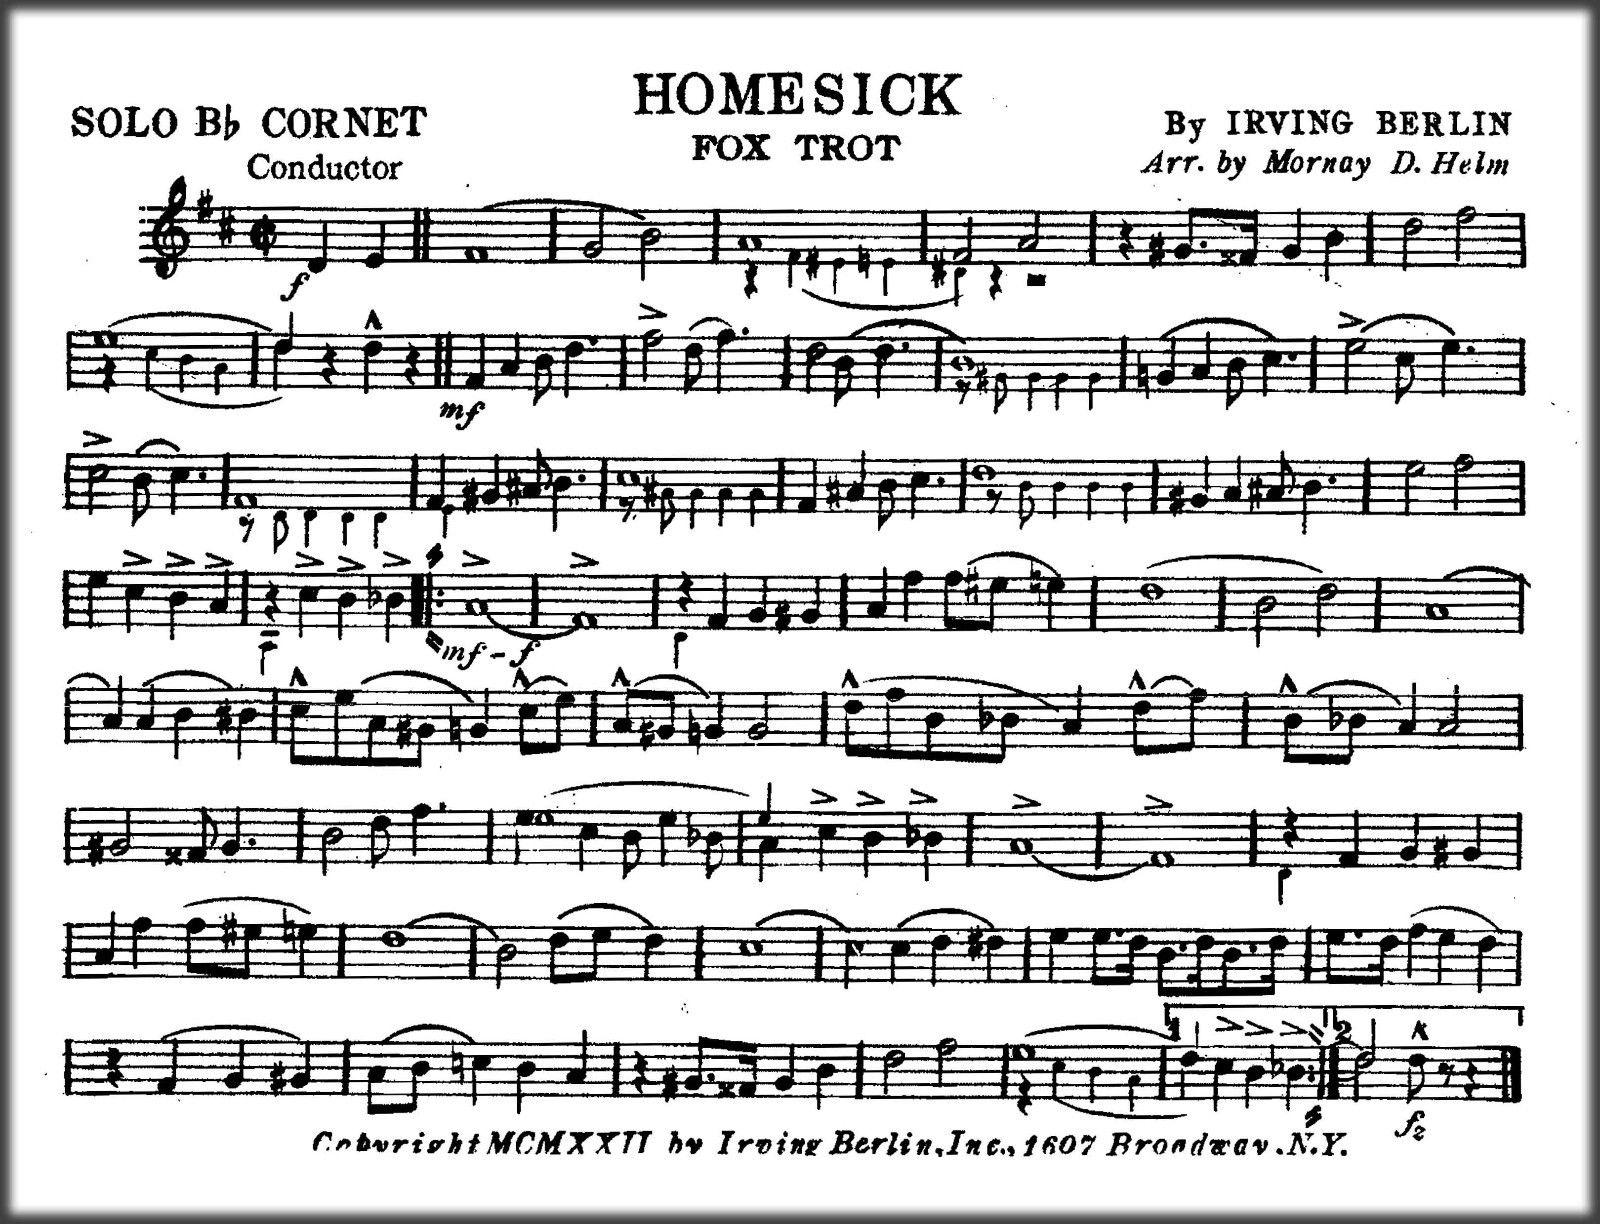 Marching band sheet music homesick fox trot irving berlin marching band sheet music homesick fox trot irving berlin ebook pdf fandeluxe Ebook collections